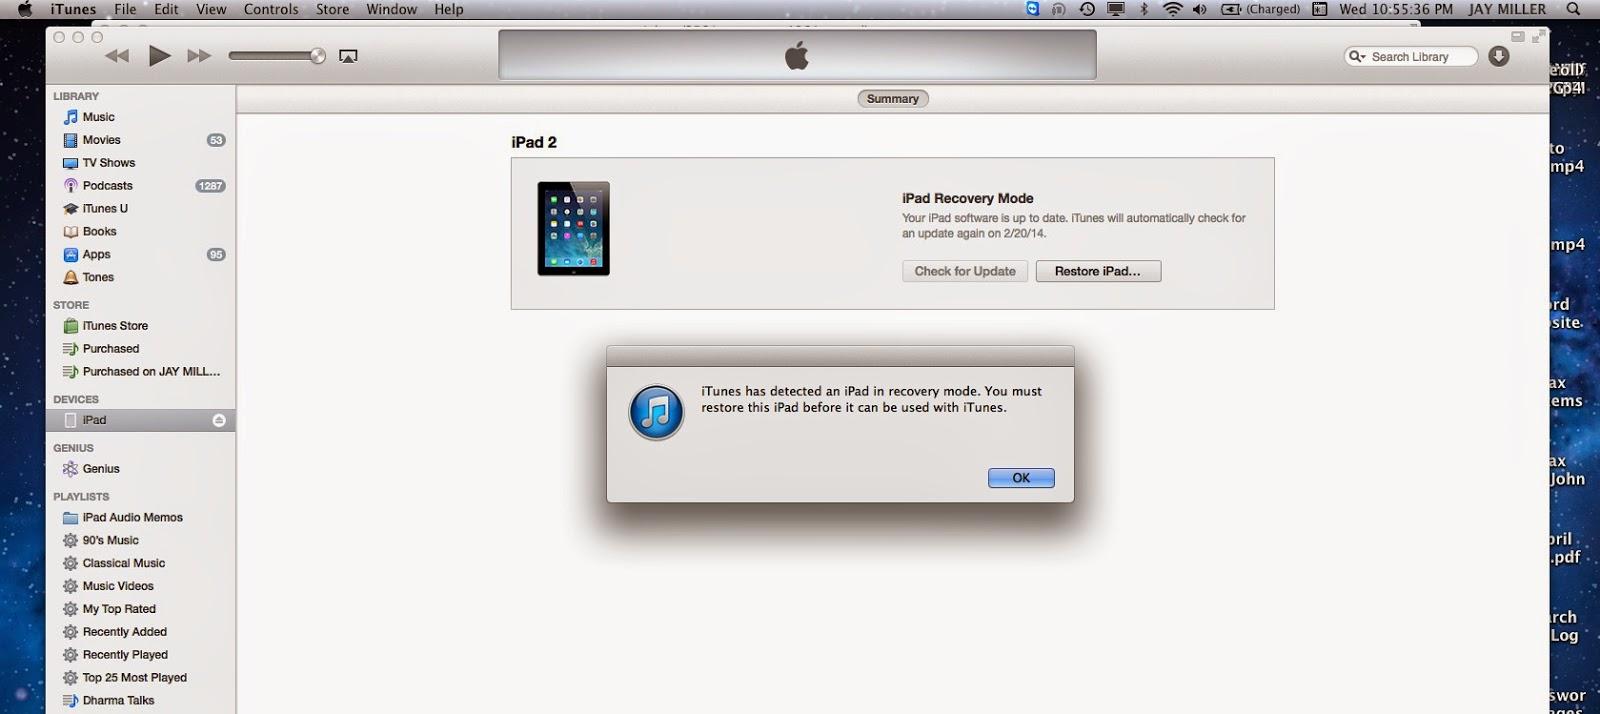 Restoring iPhone, iPad, iPod